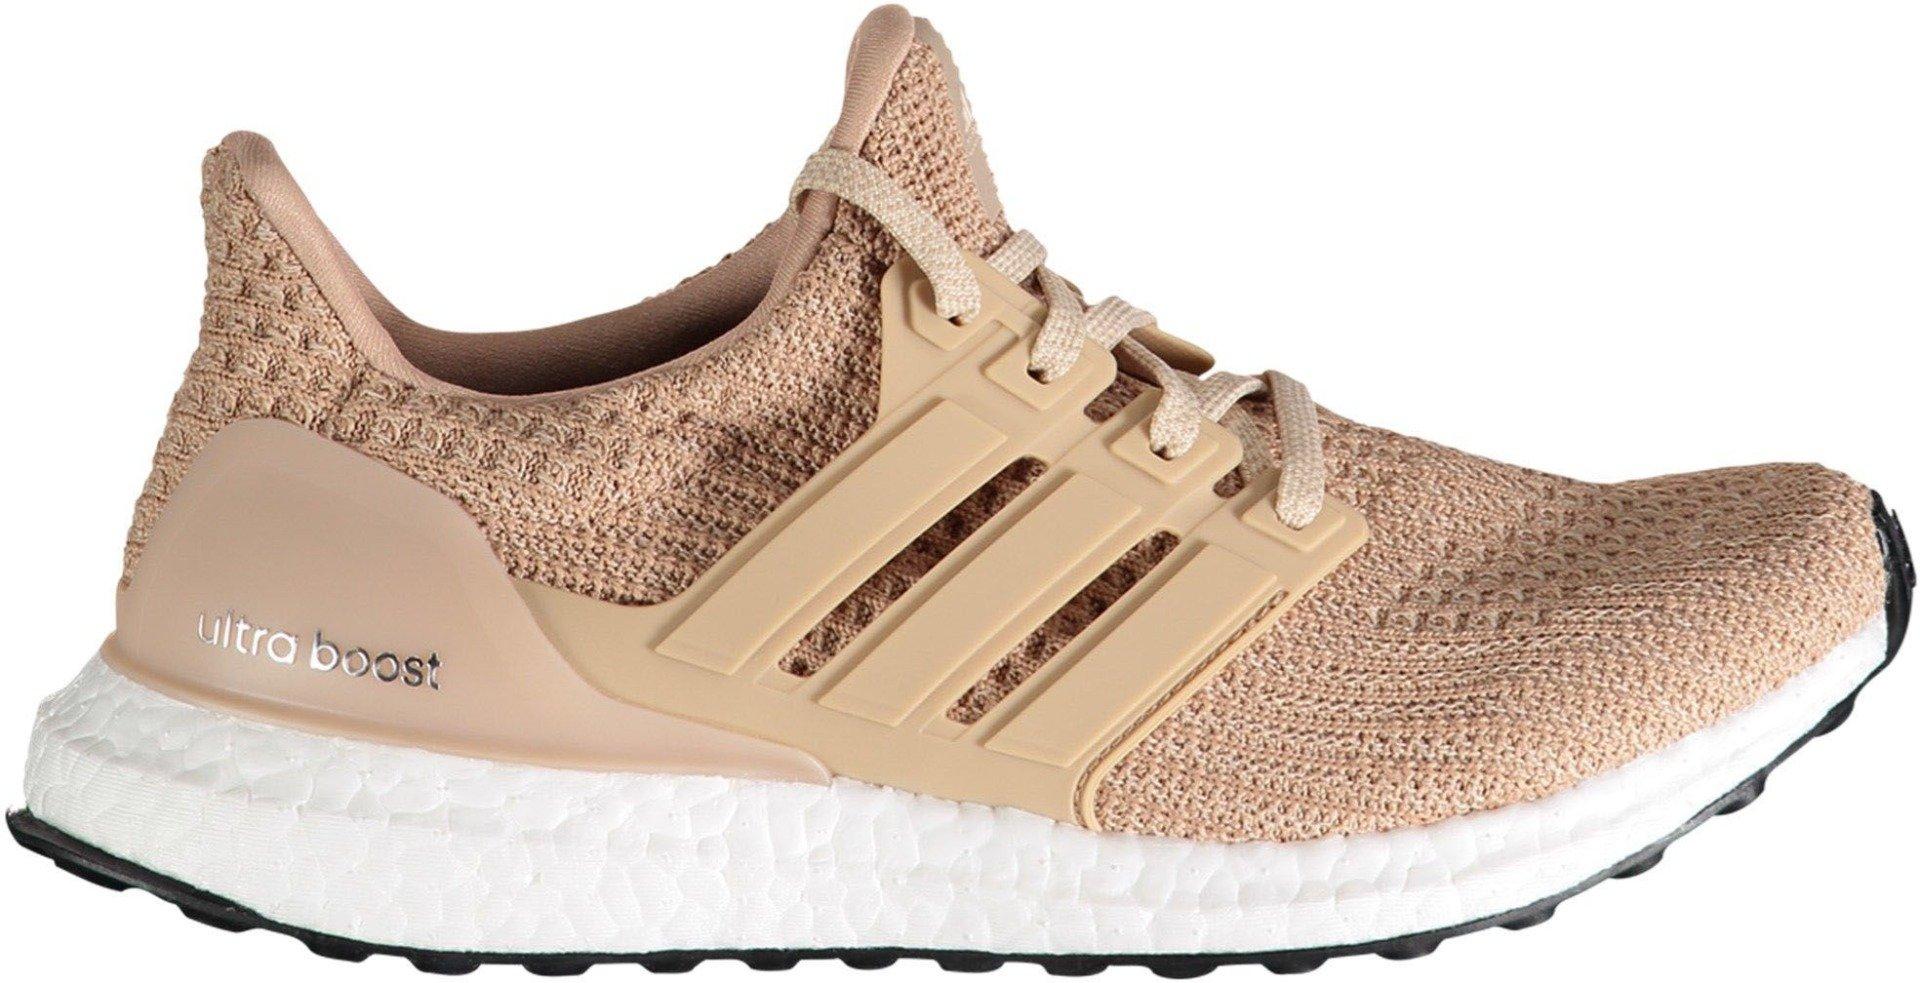 Adidas UltraBOOST dame